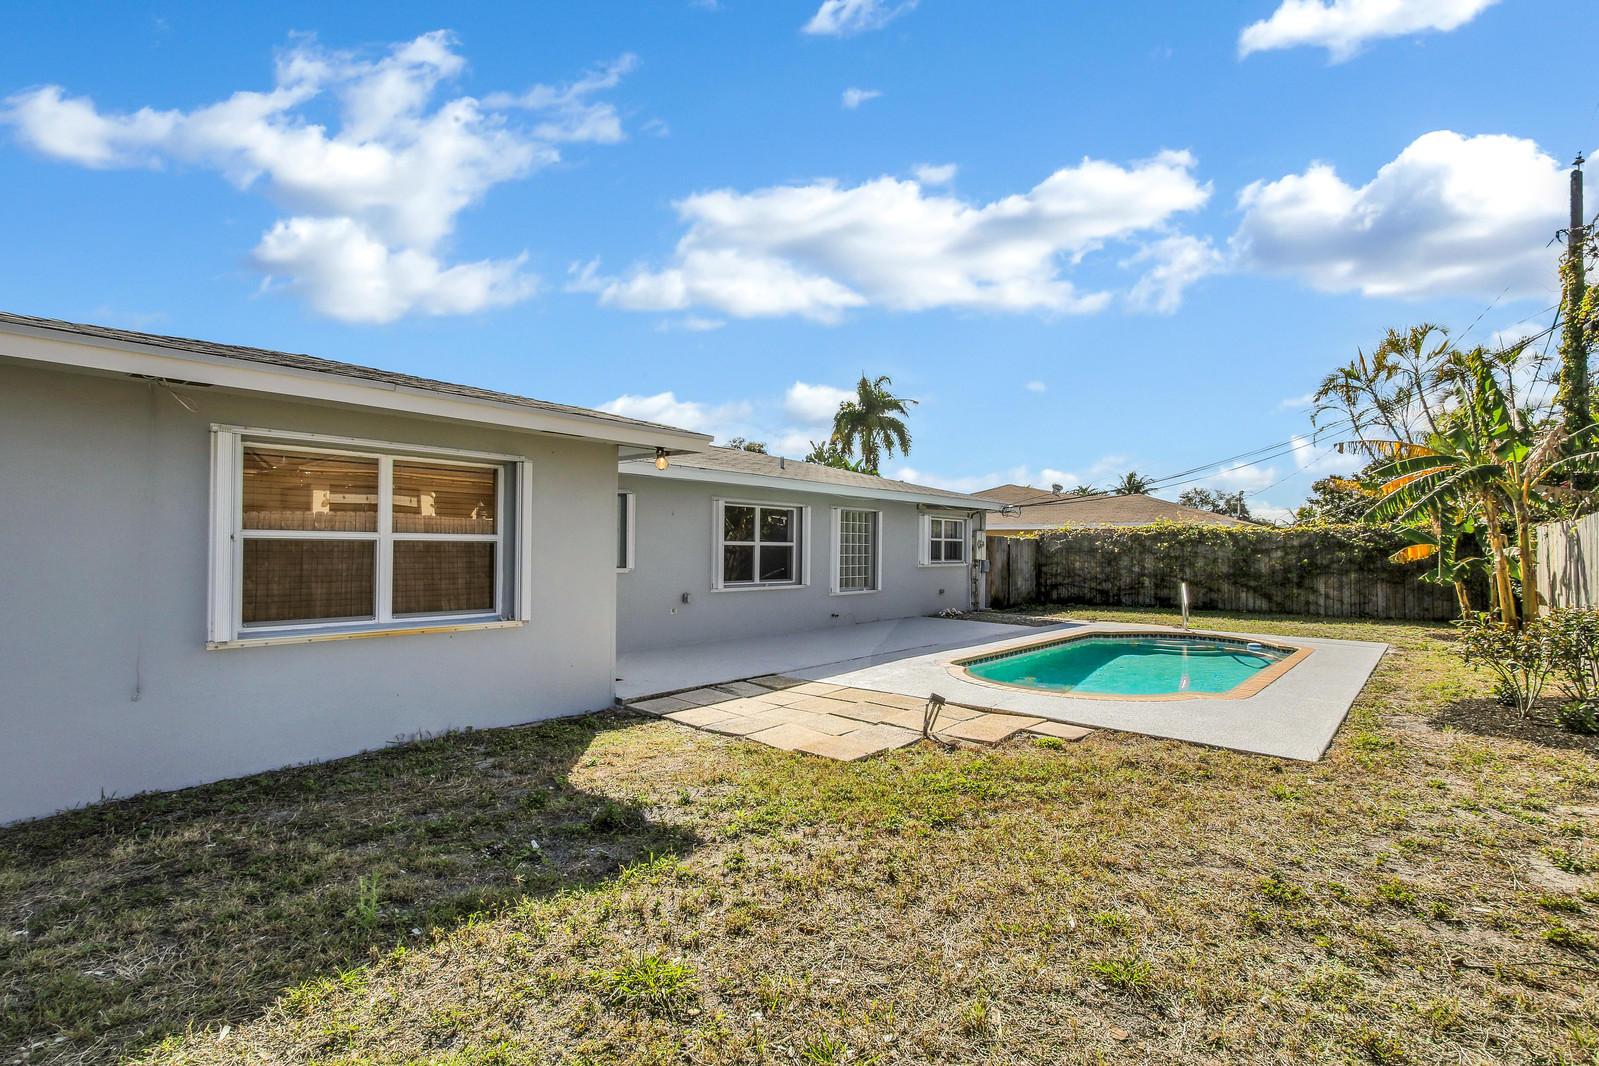 2717 Cambridge Road, Lake Worth, FL 33462